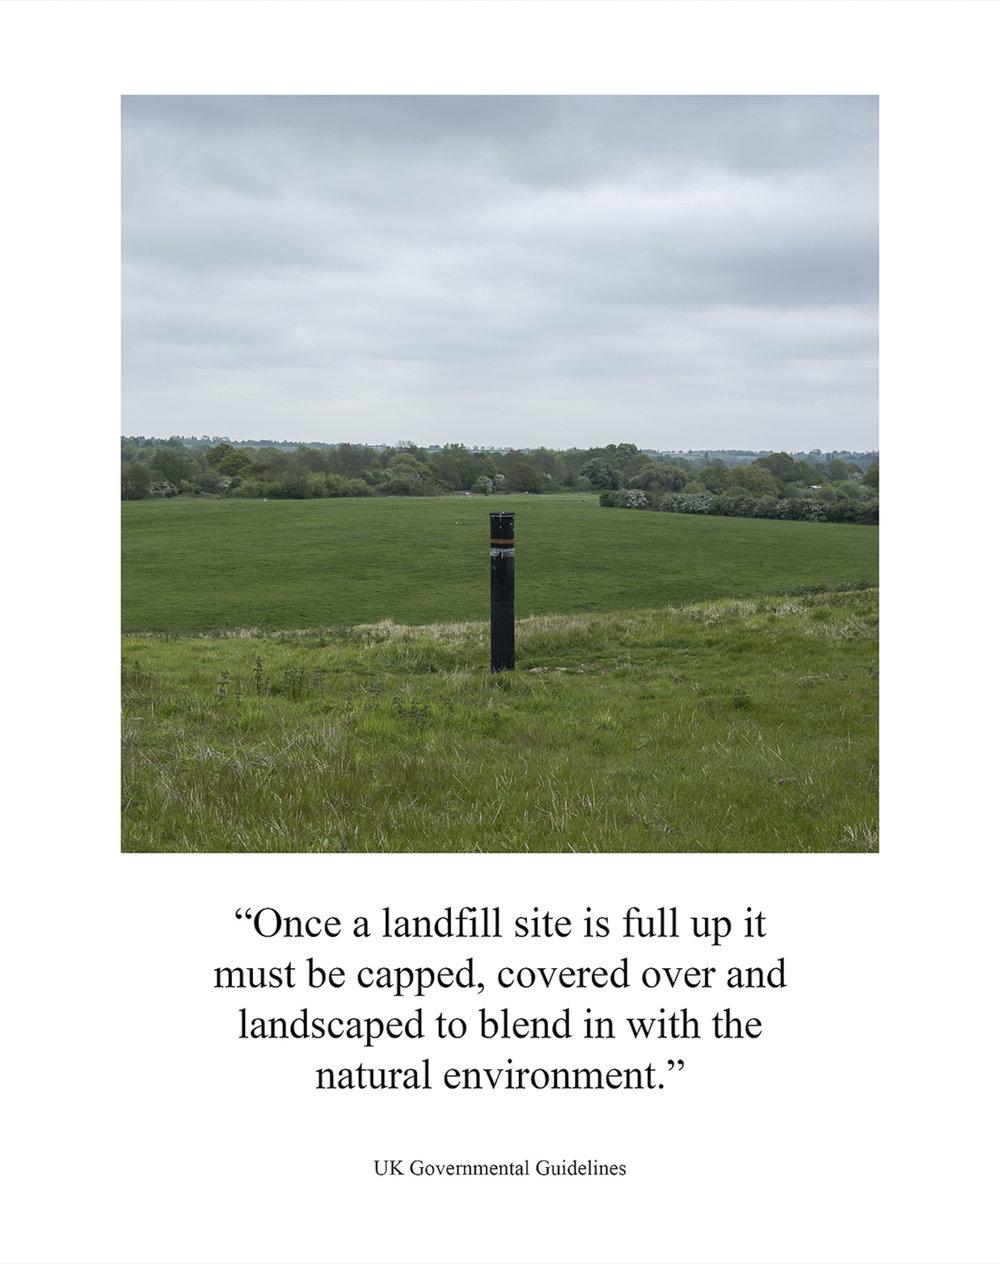 Godmanchester Historic Landfill Site, 2017